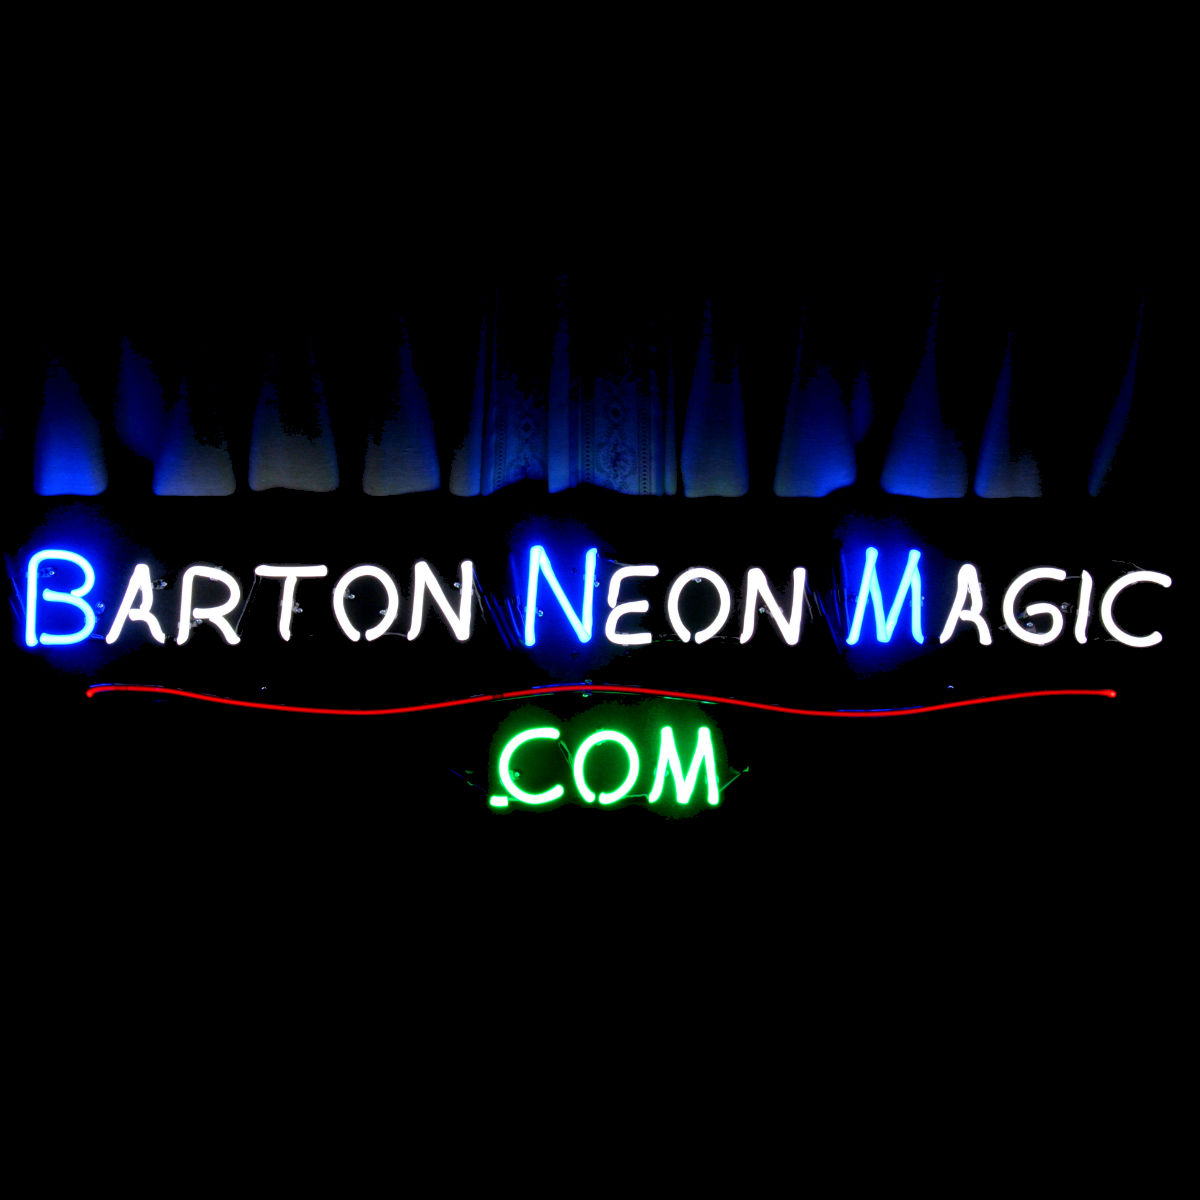 Scottie Dog Neon Light Sculpture by John Barton - BartonNeonMagic.com